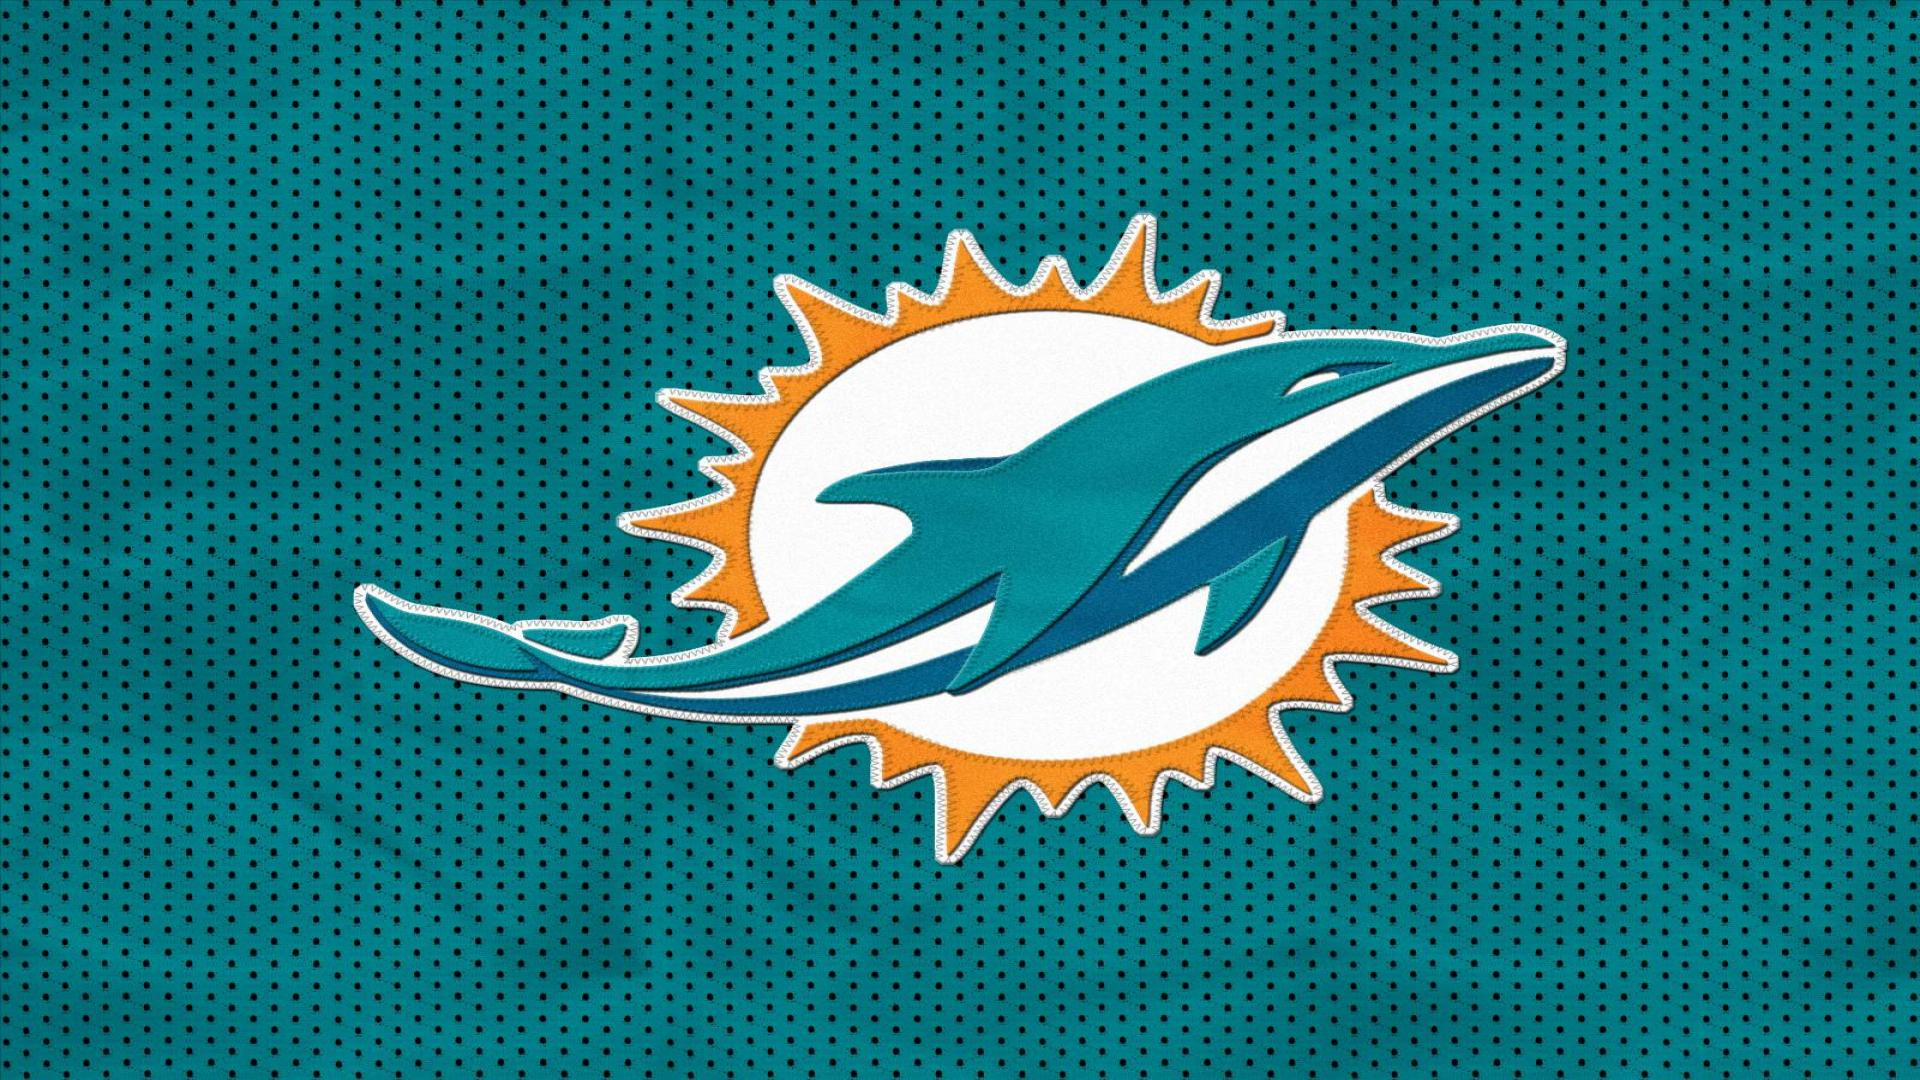 Miami Dolphins full hd wallpaper